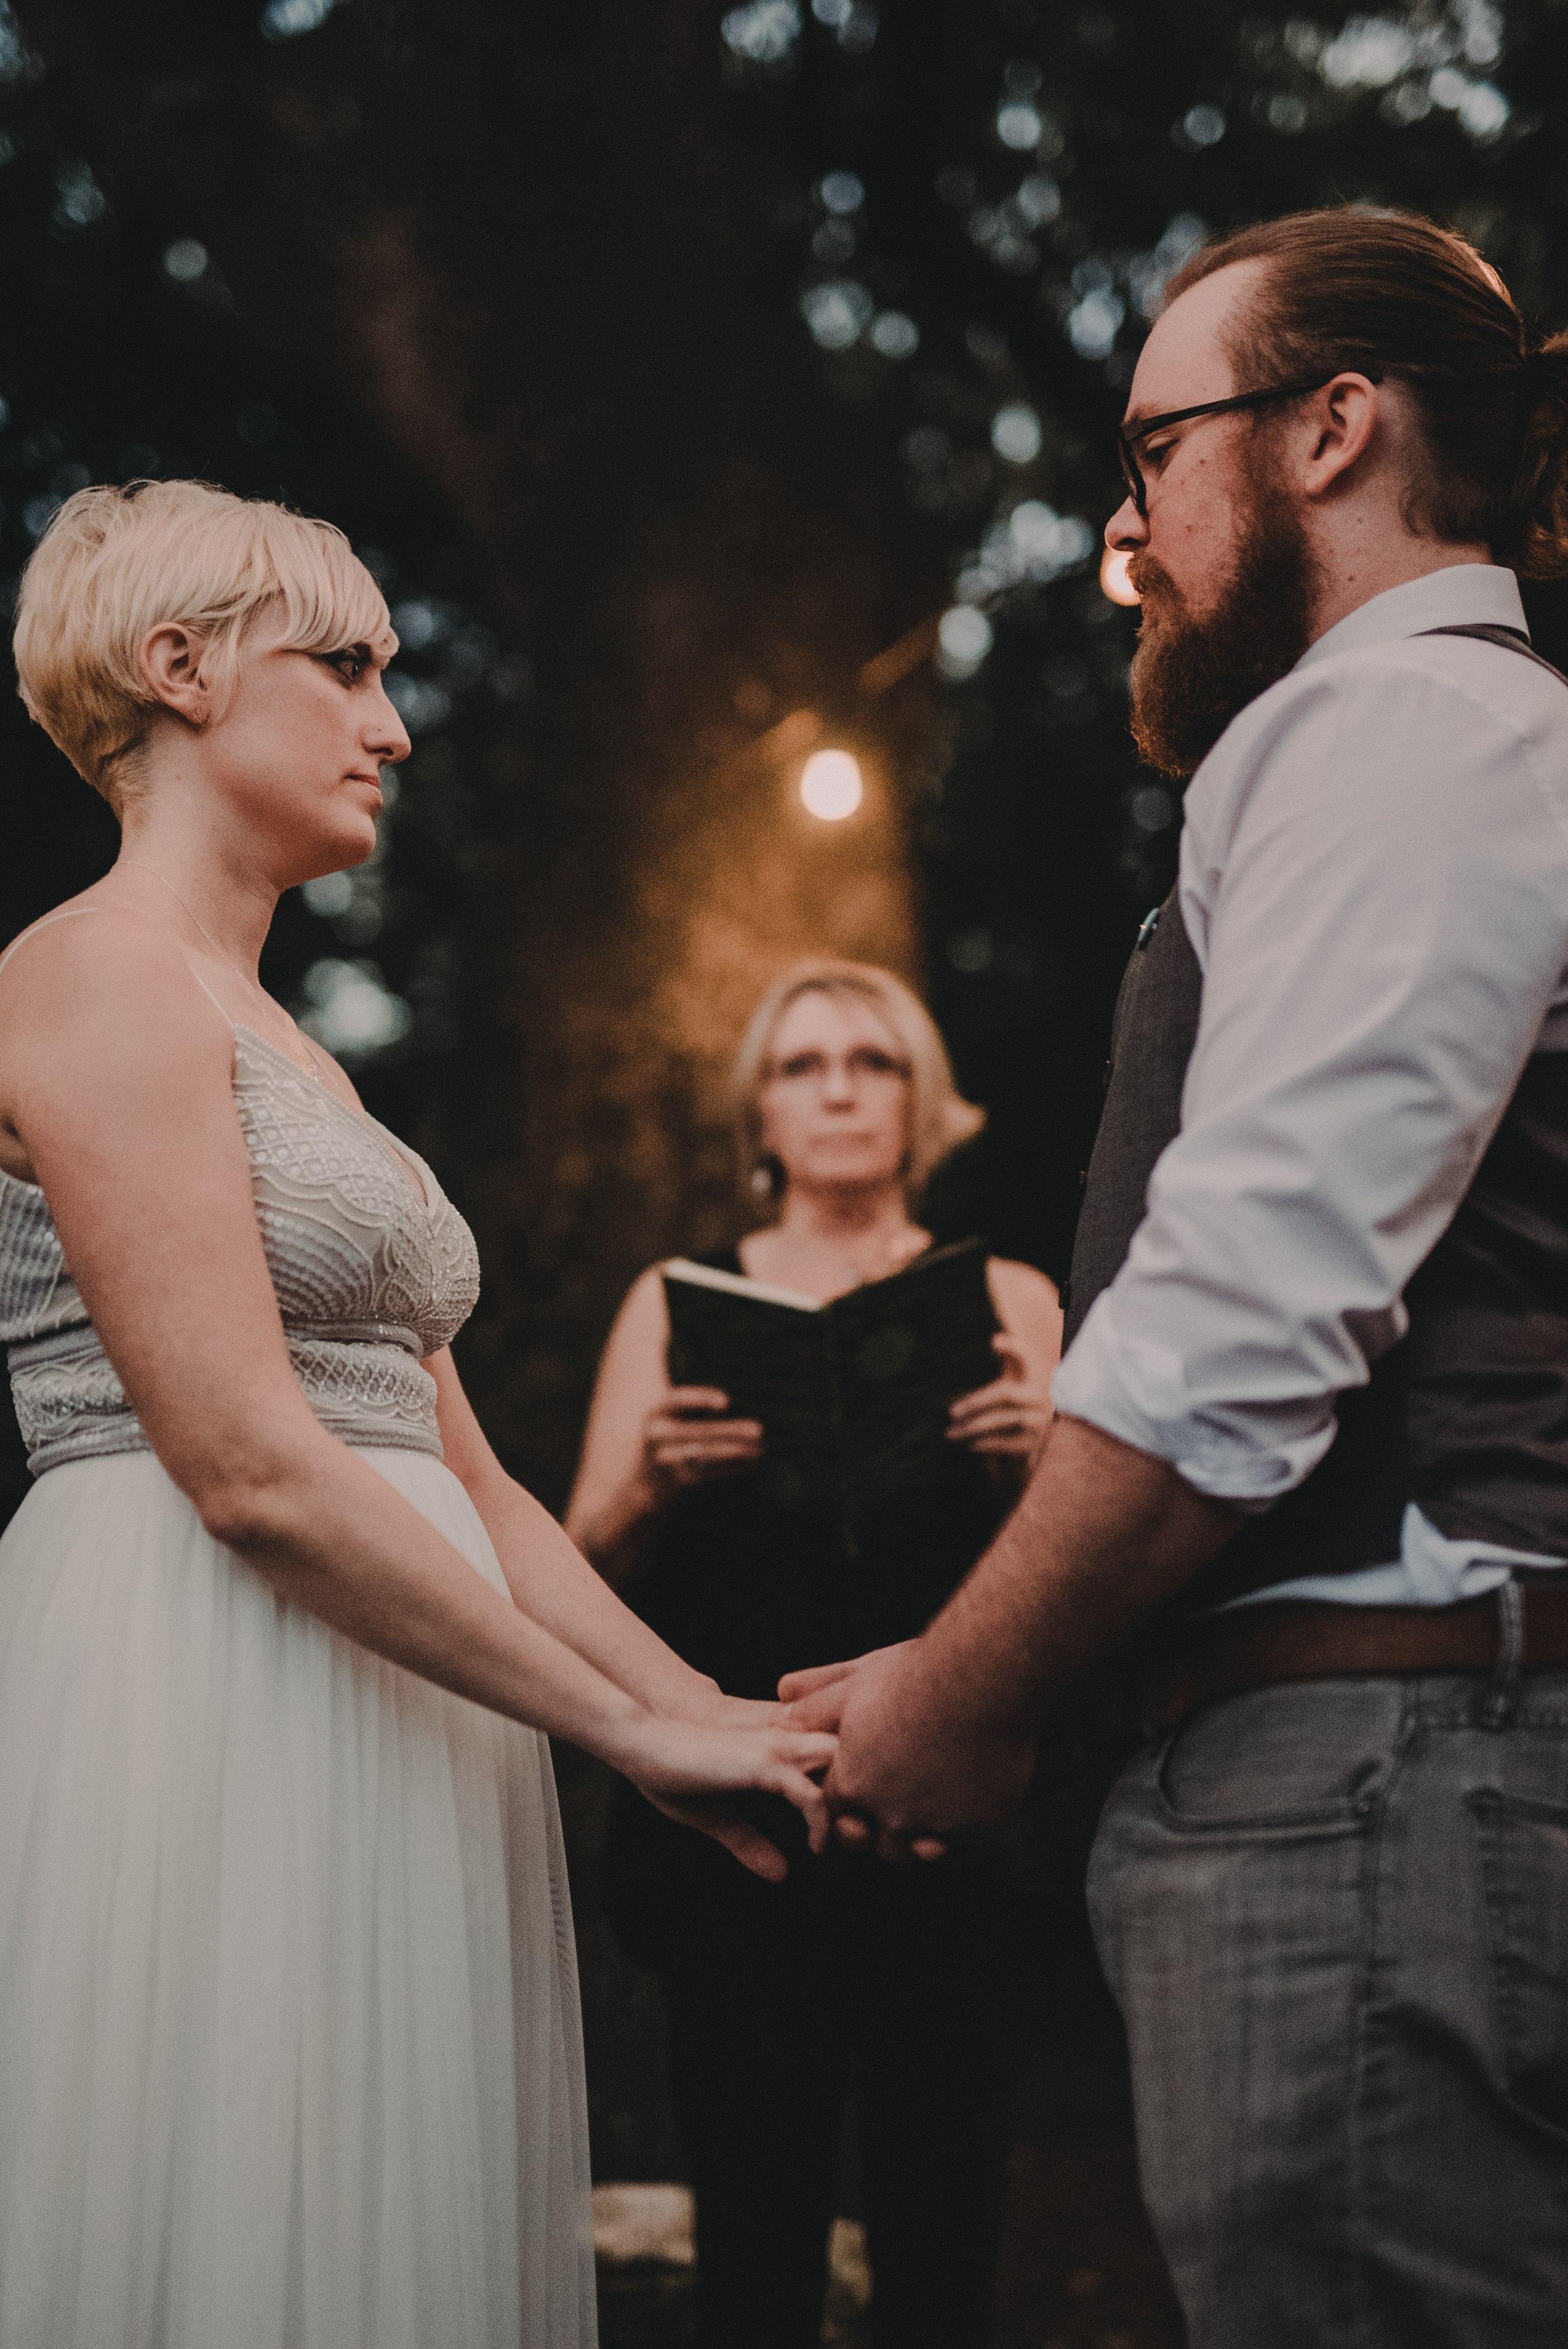 wedding ceremony in austin texas